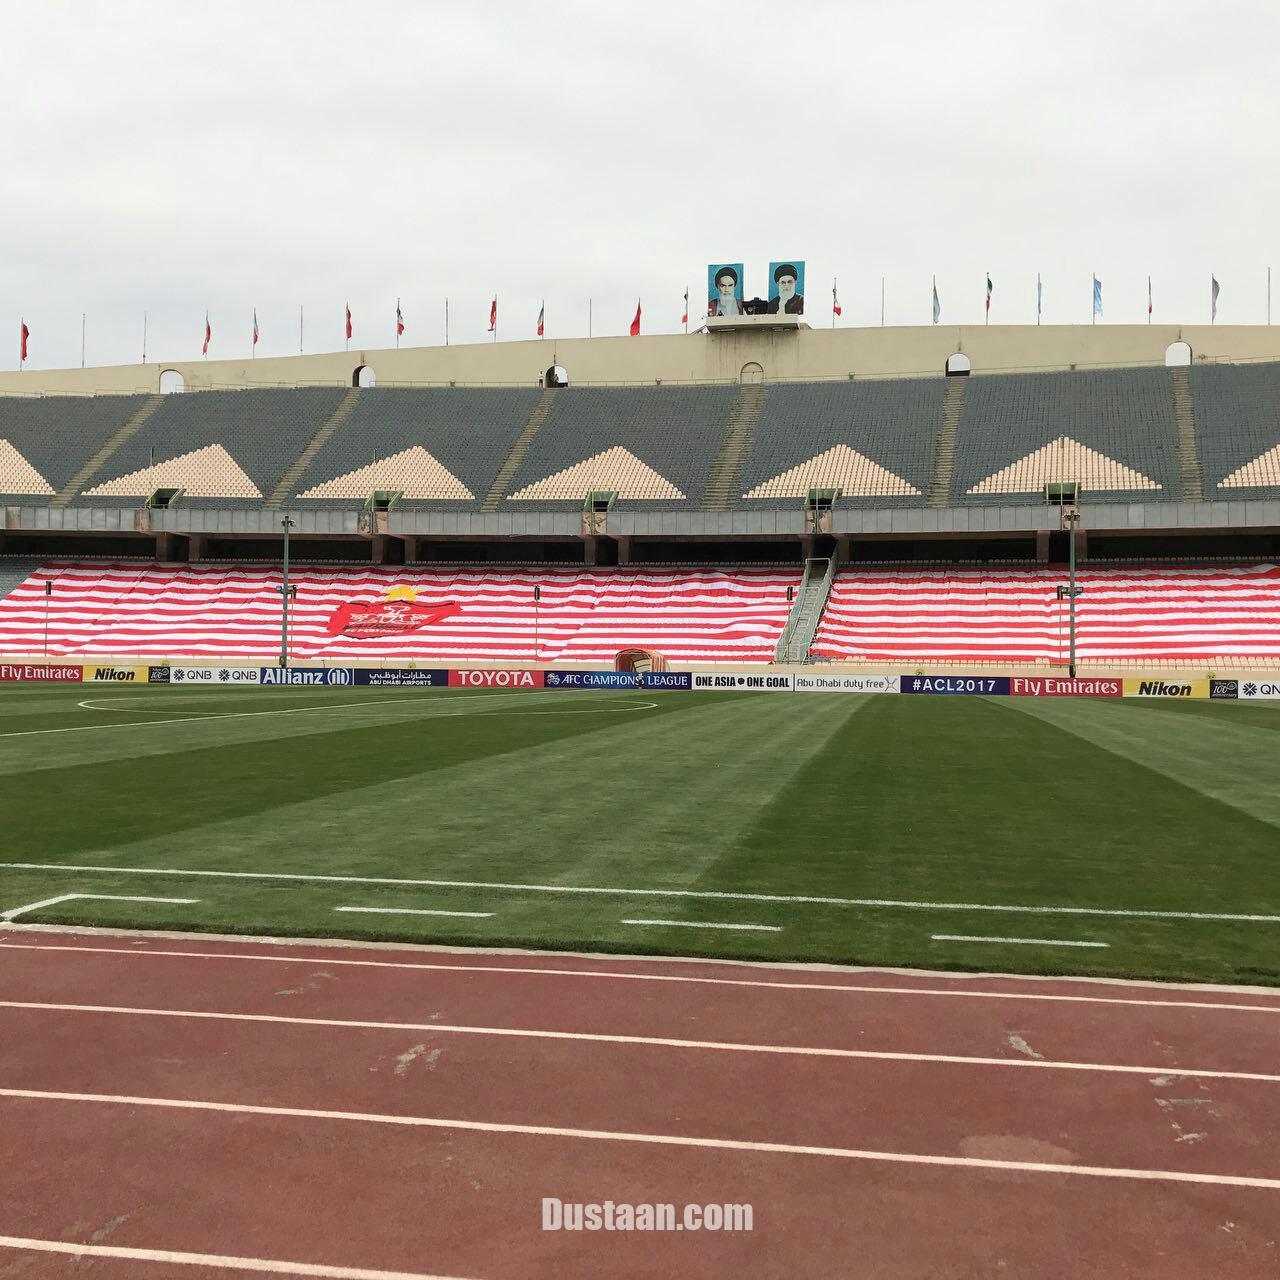 www.dustaan.com پرچمها جانشین هوادران پرسپولیس شدند! +عکس